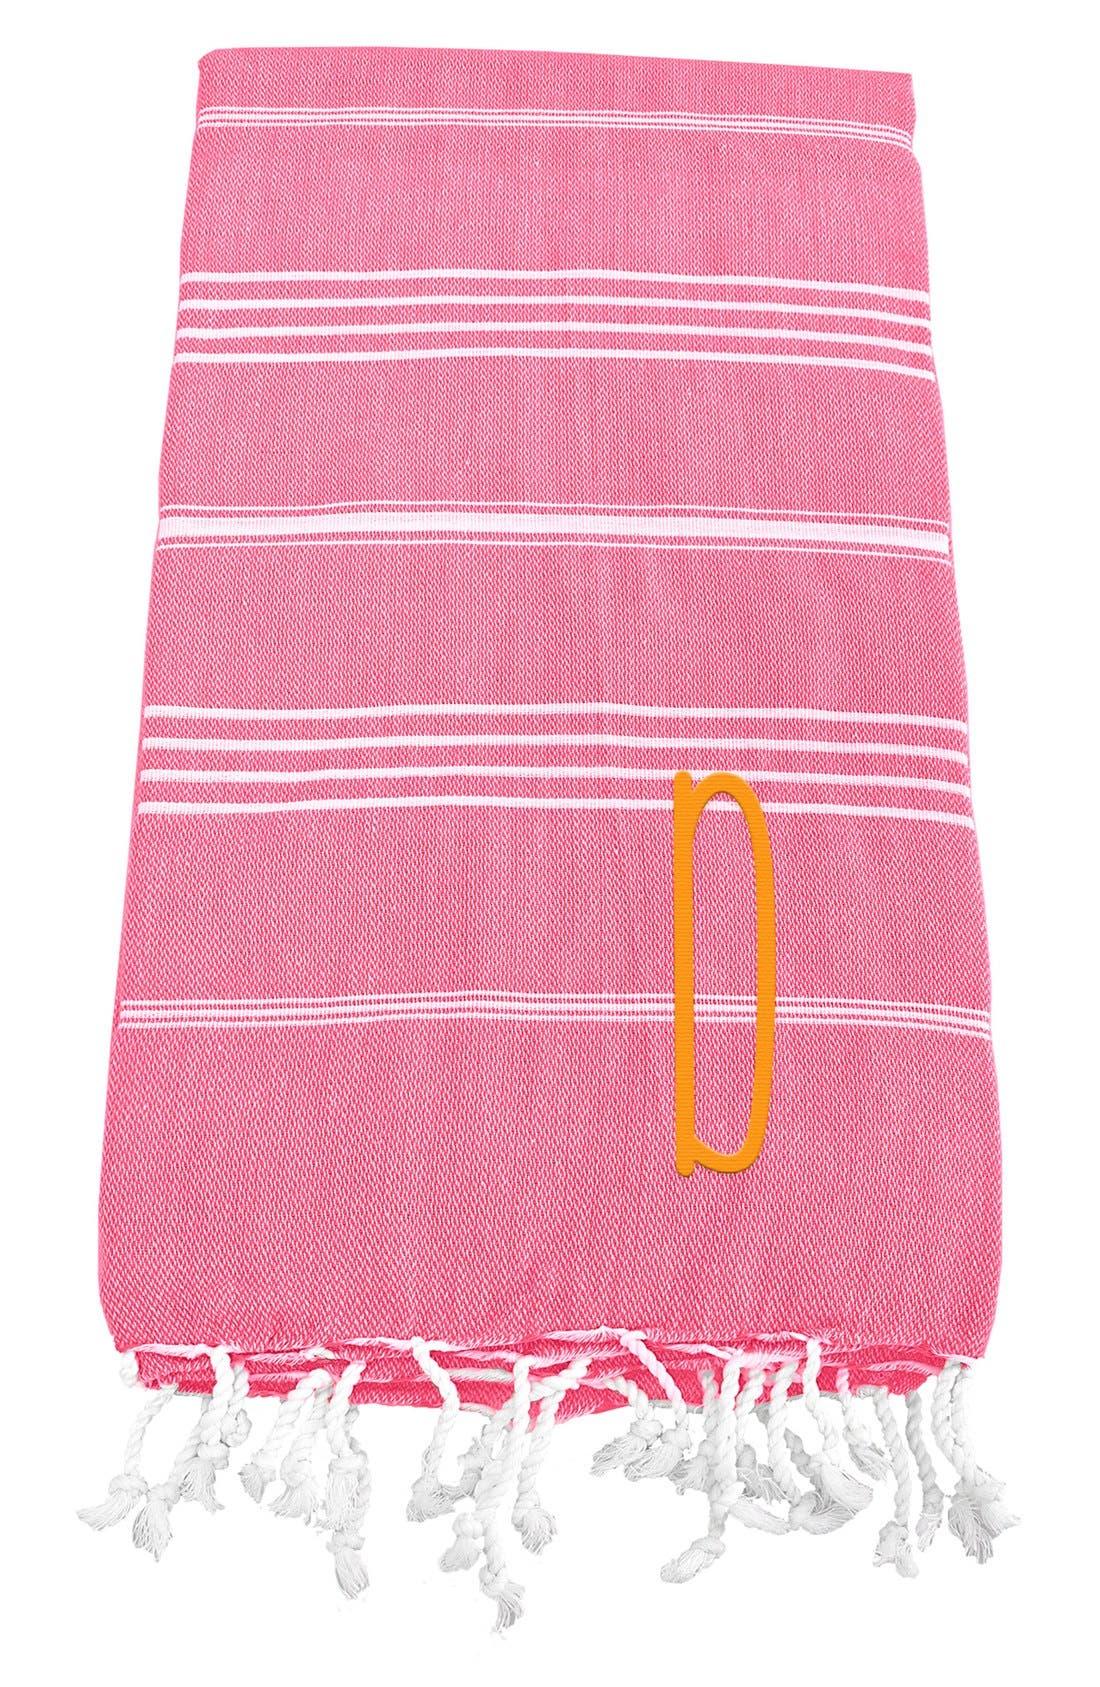 Monogram Turkish Cotton Towel,                             Main thumbnail 140, color,